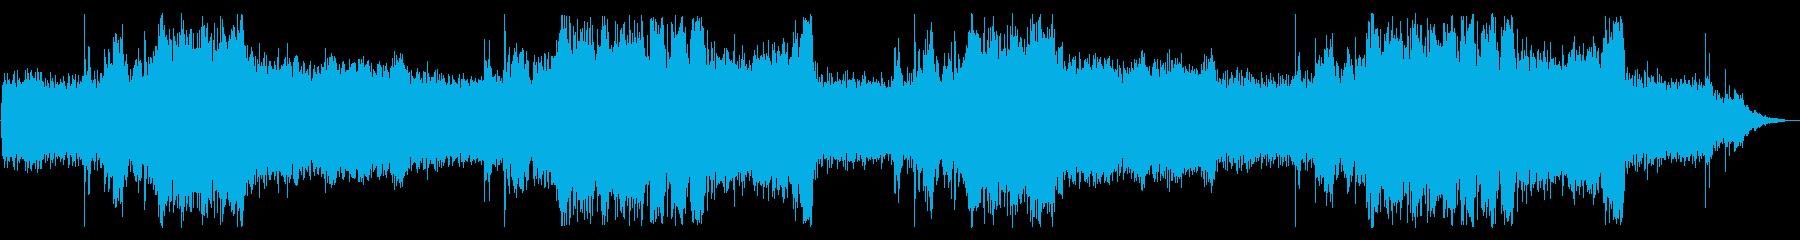 RPGのボス戦をイメージしたオーケストラの再生済みの波形